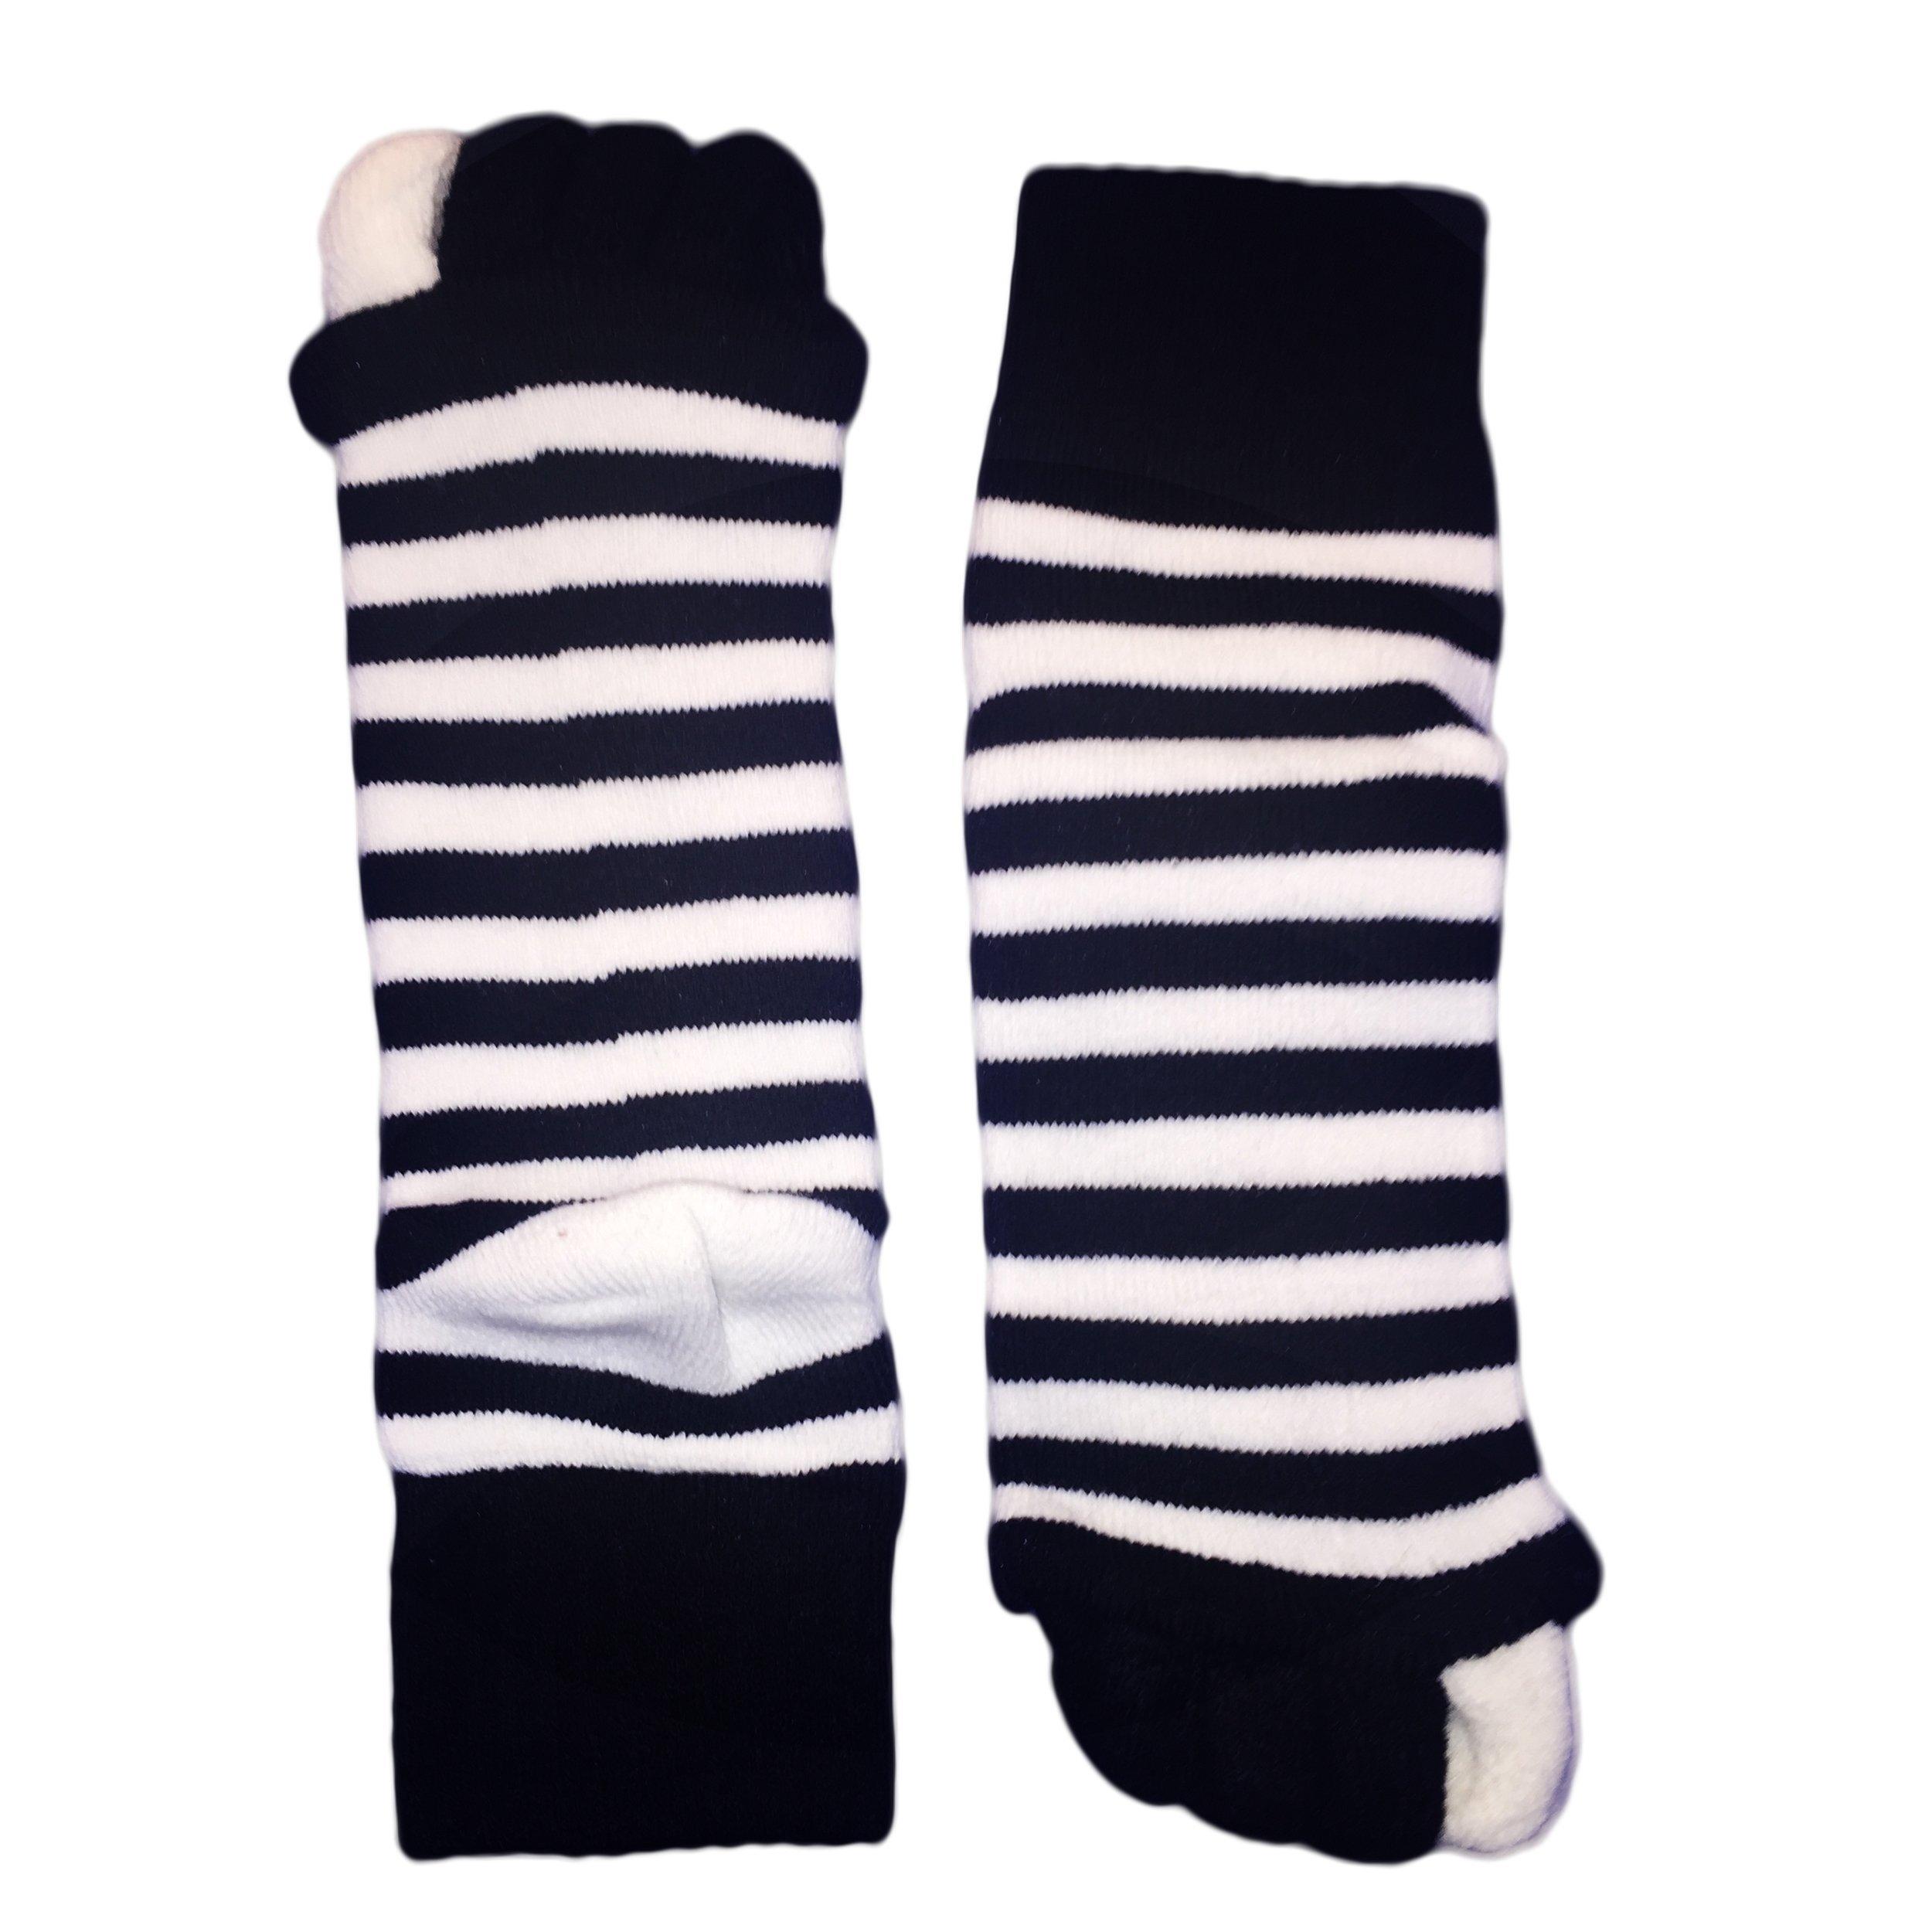 Moja Sports (Black/White, 1Pair) Toes Alignment Socks Open Five Toe Separator Spacer Relaxing Comfort Tendon Pain Relief Comfy Foot Sock Yoga Gym Pedicure (Black/White : 1 Pair, Medium)